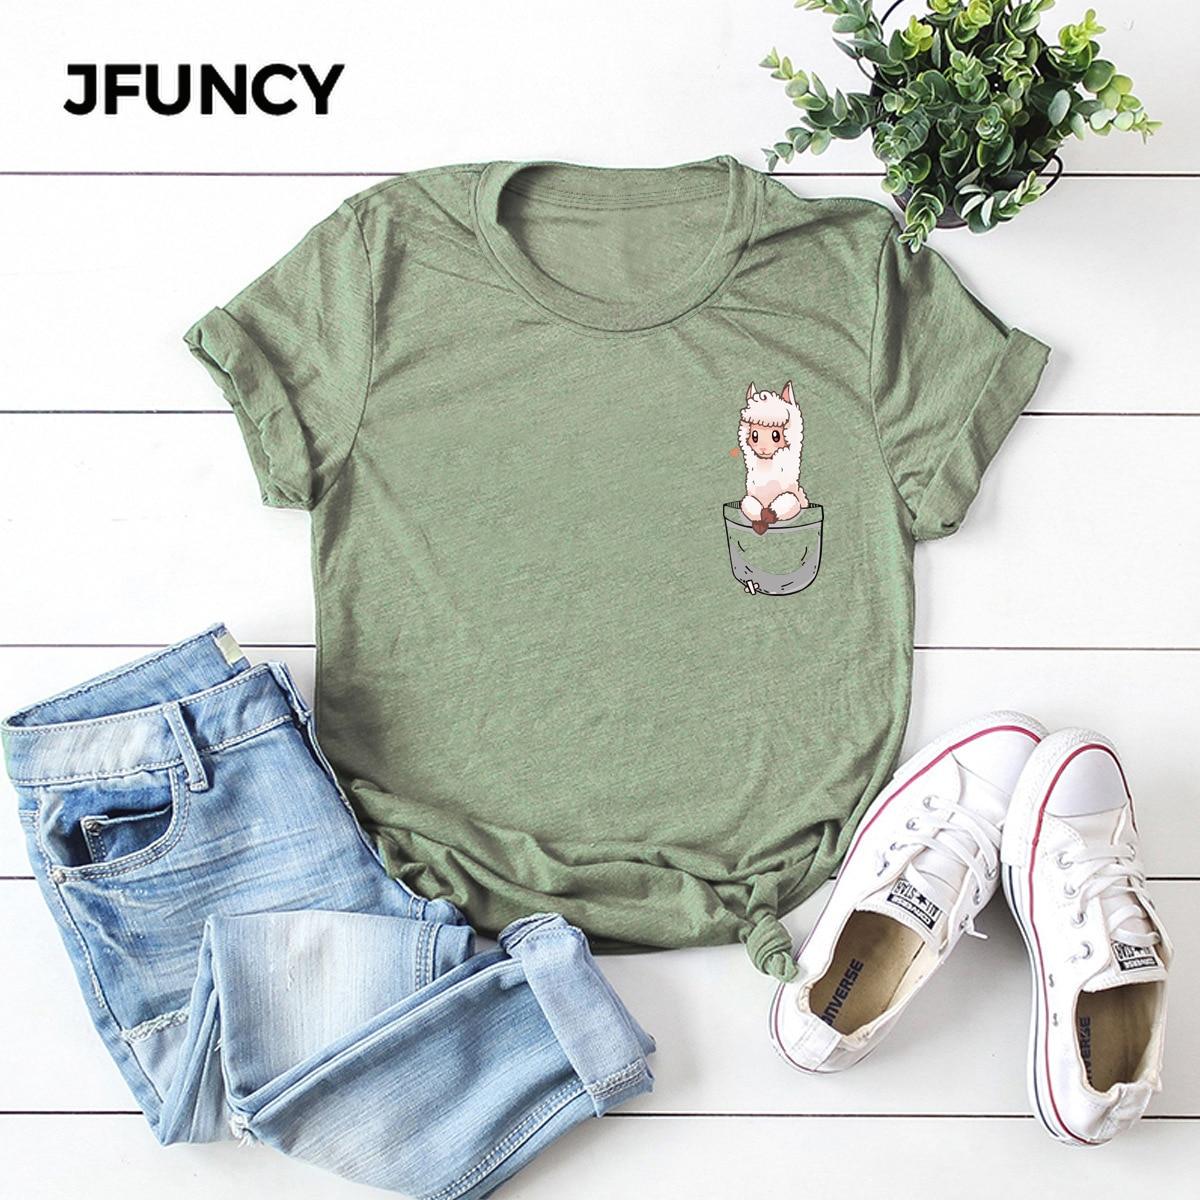 JFUNCY Cartoon Pocket Print Plus Size Women Loose Tees Tops 100% Cotton Summer Shirts Woman T-Shirt Fashion Female Casual Tshirt